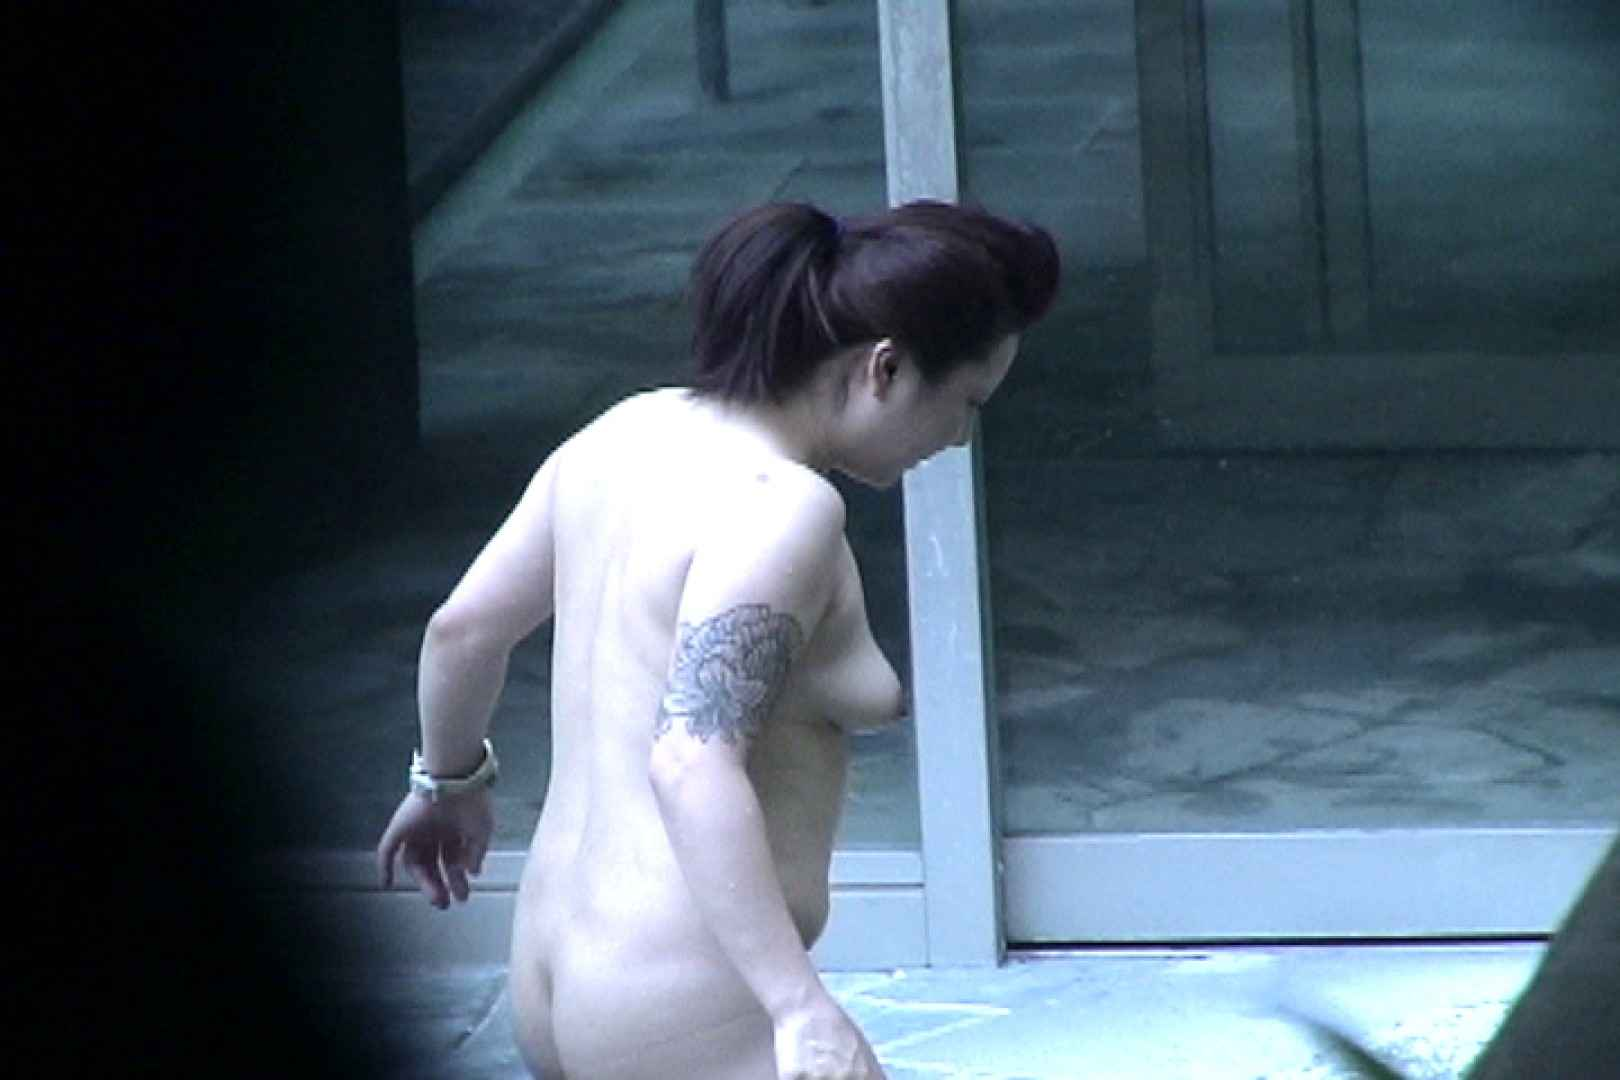 Aquaな露天風呂Vol.453 0  66連発 6